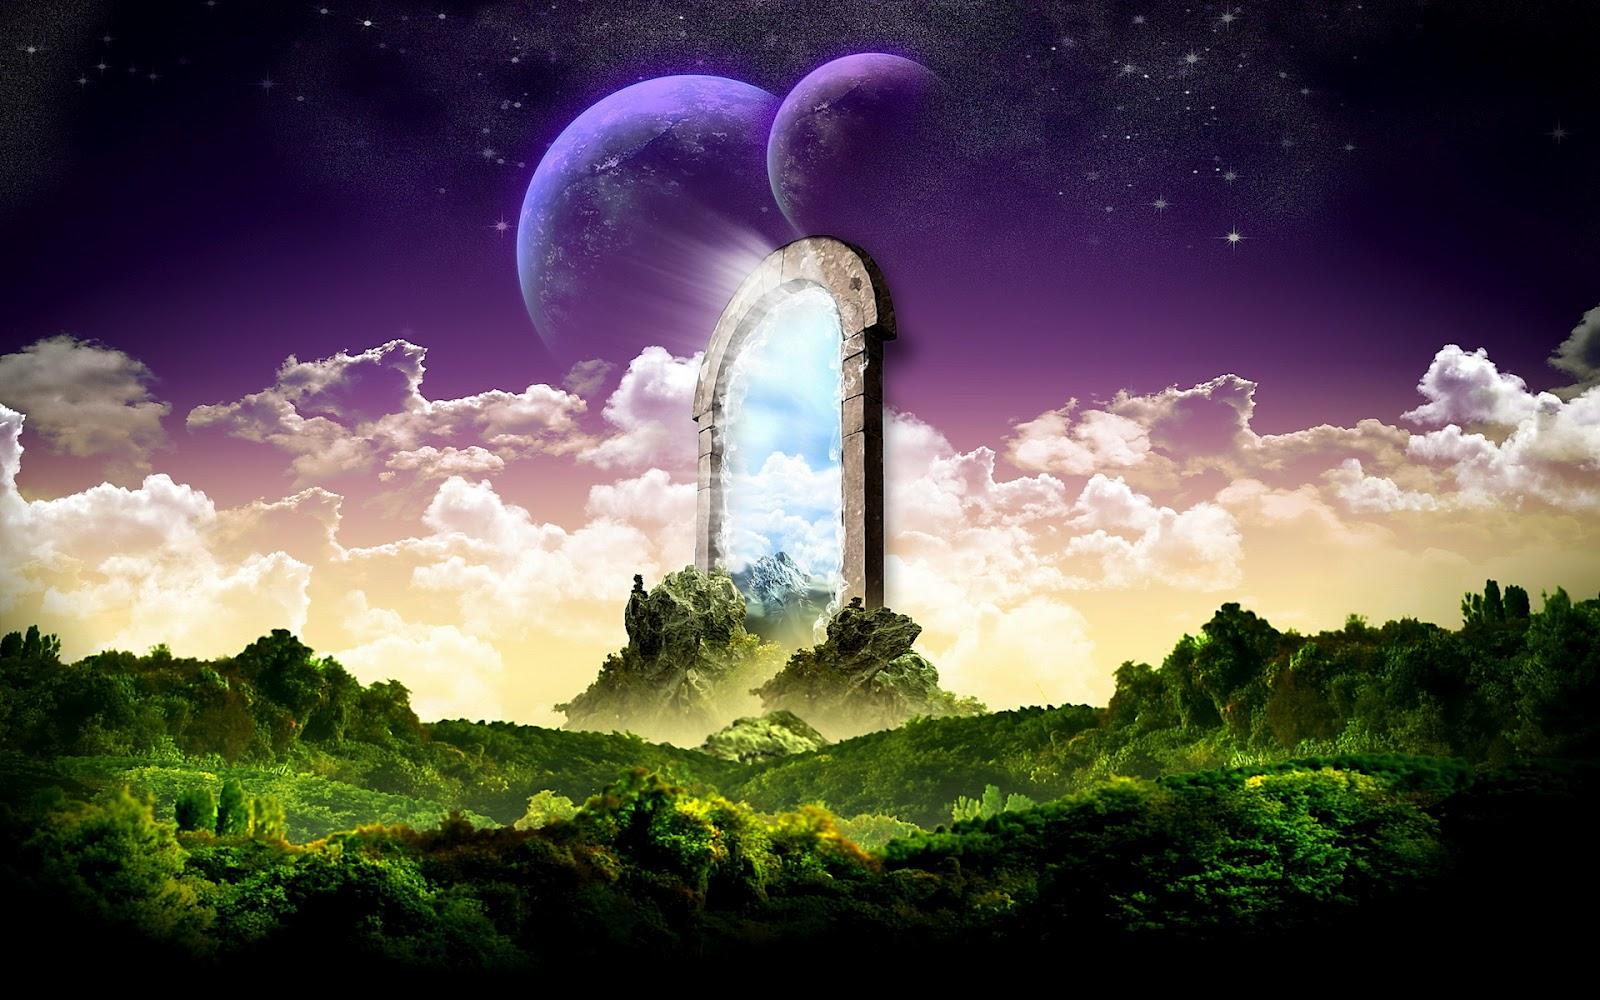 http://1.bp.blogspot.com/-Bxaw1ln5q1w/T56xfYcU68I/AAAAAAAAAN0/MU25BFo2SbQ/s1600/Fantasy-Wallpaper-imagination-28242215-1920-1200.jpg